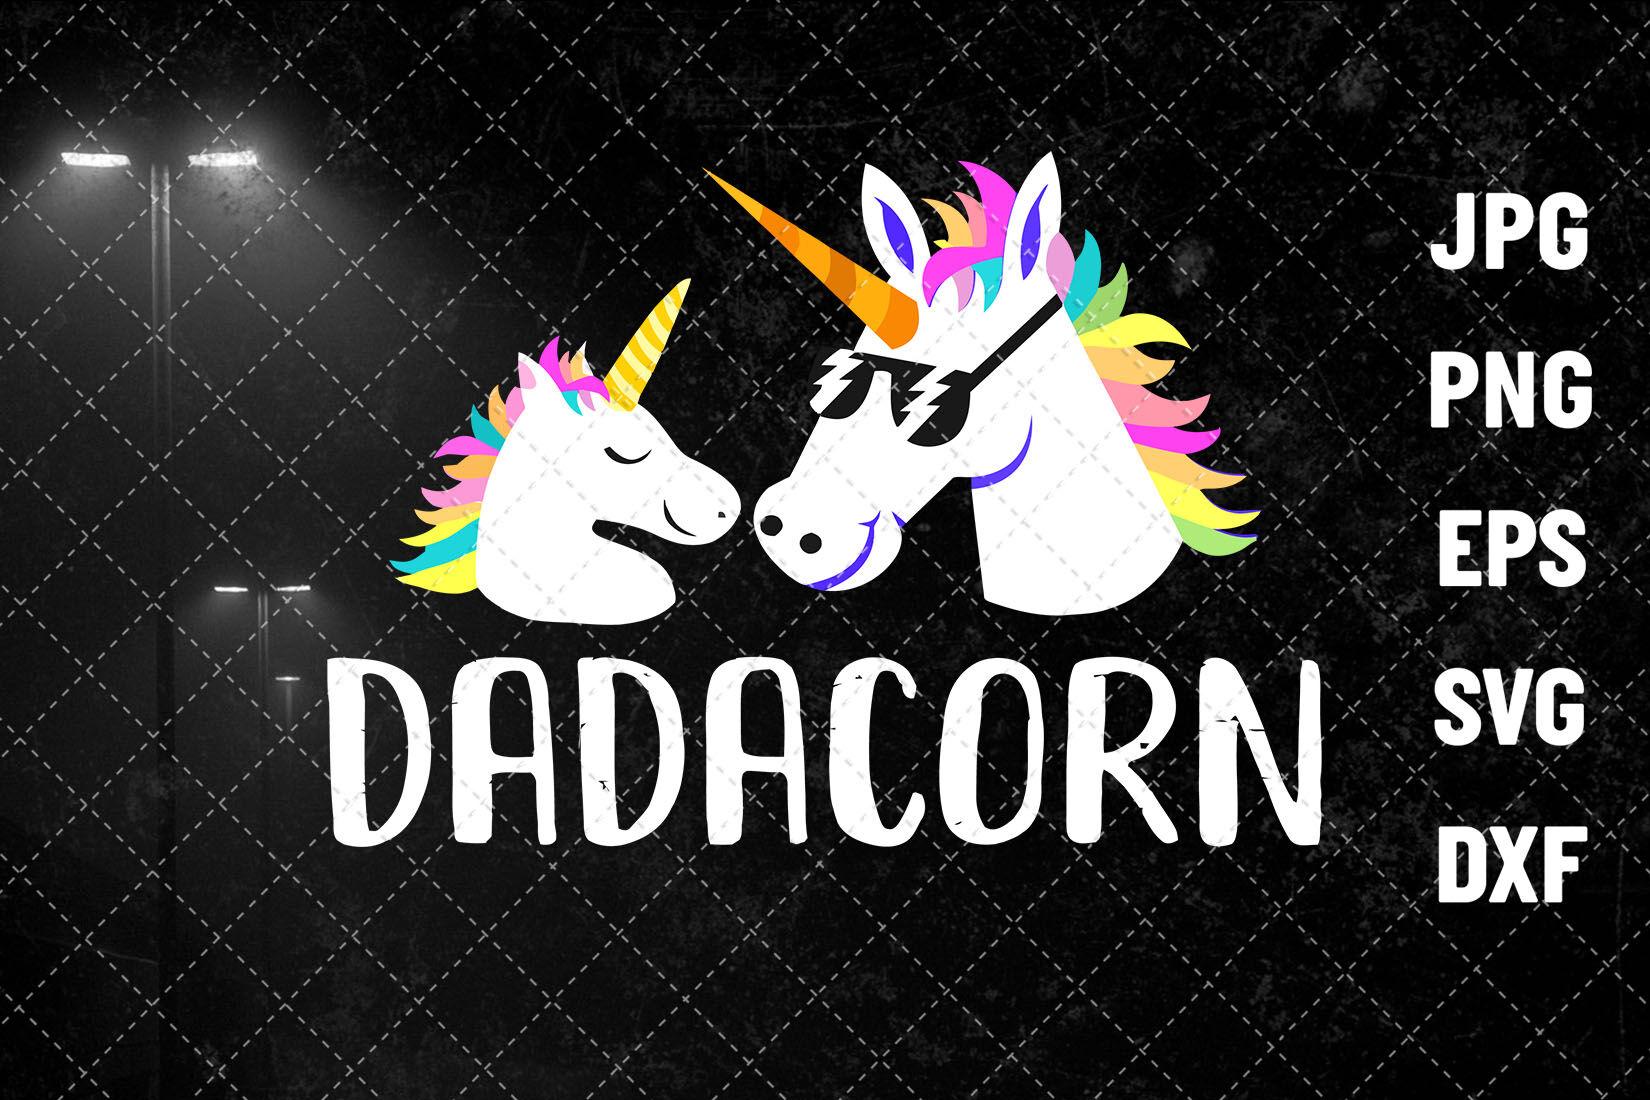 Dadacorn Svg Unicorn Svg Unicorn Lover I Believe In Unicorn By